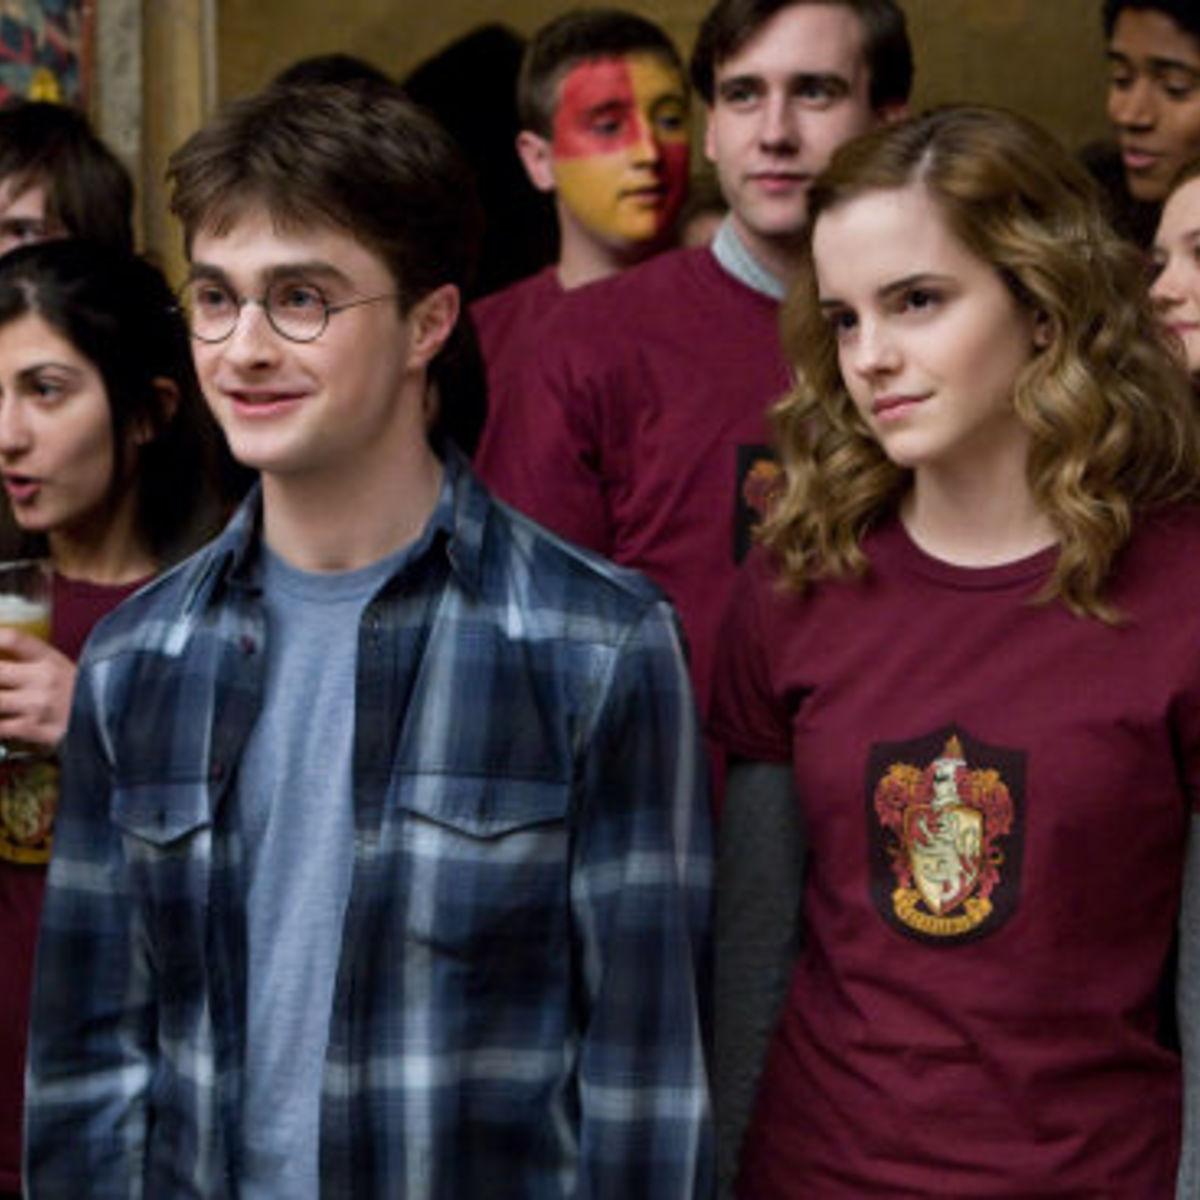 HarryPotter_HalfBloodPrince_Harry_Hermione.jpg